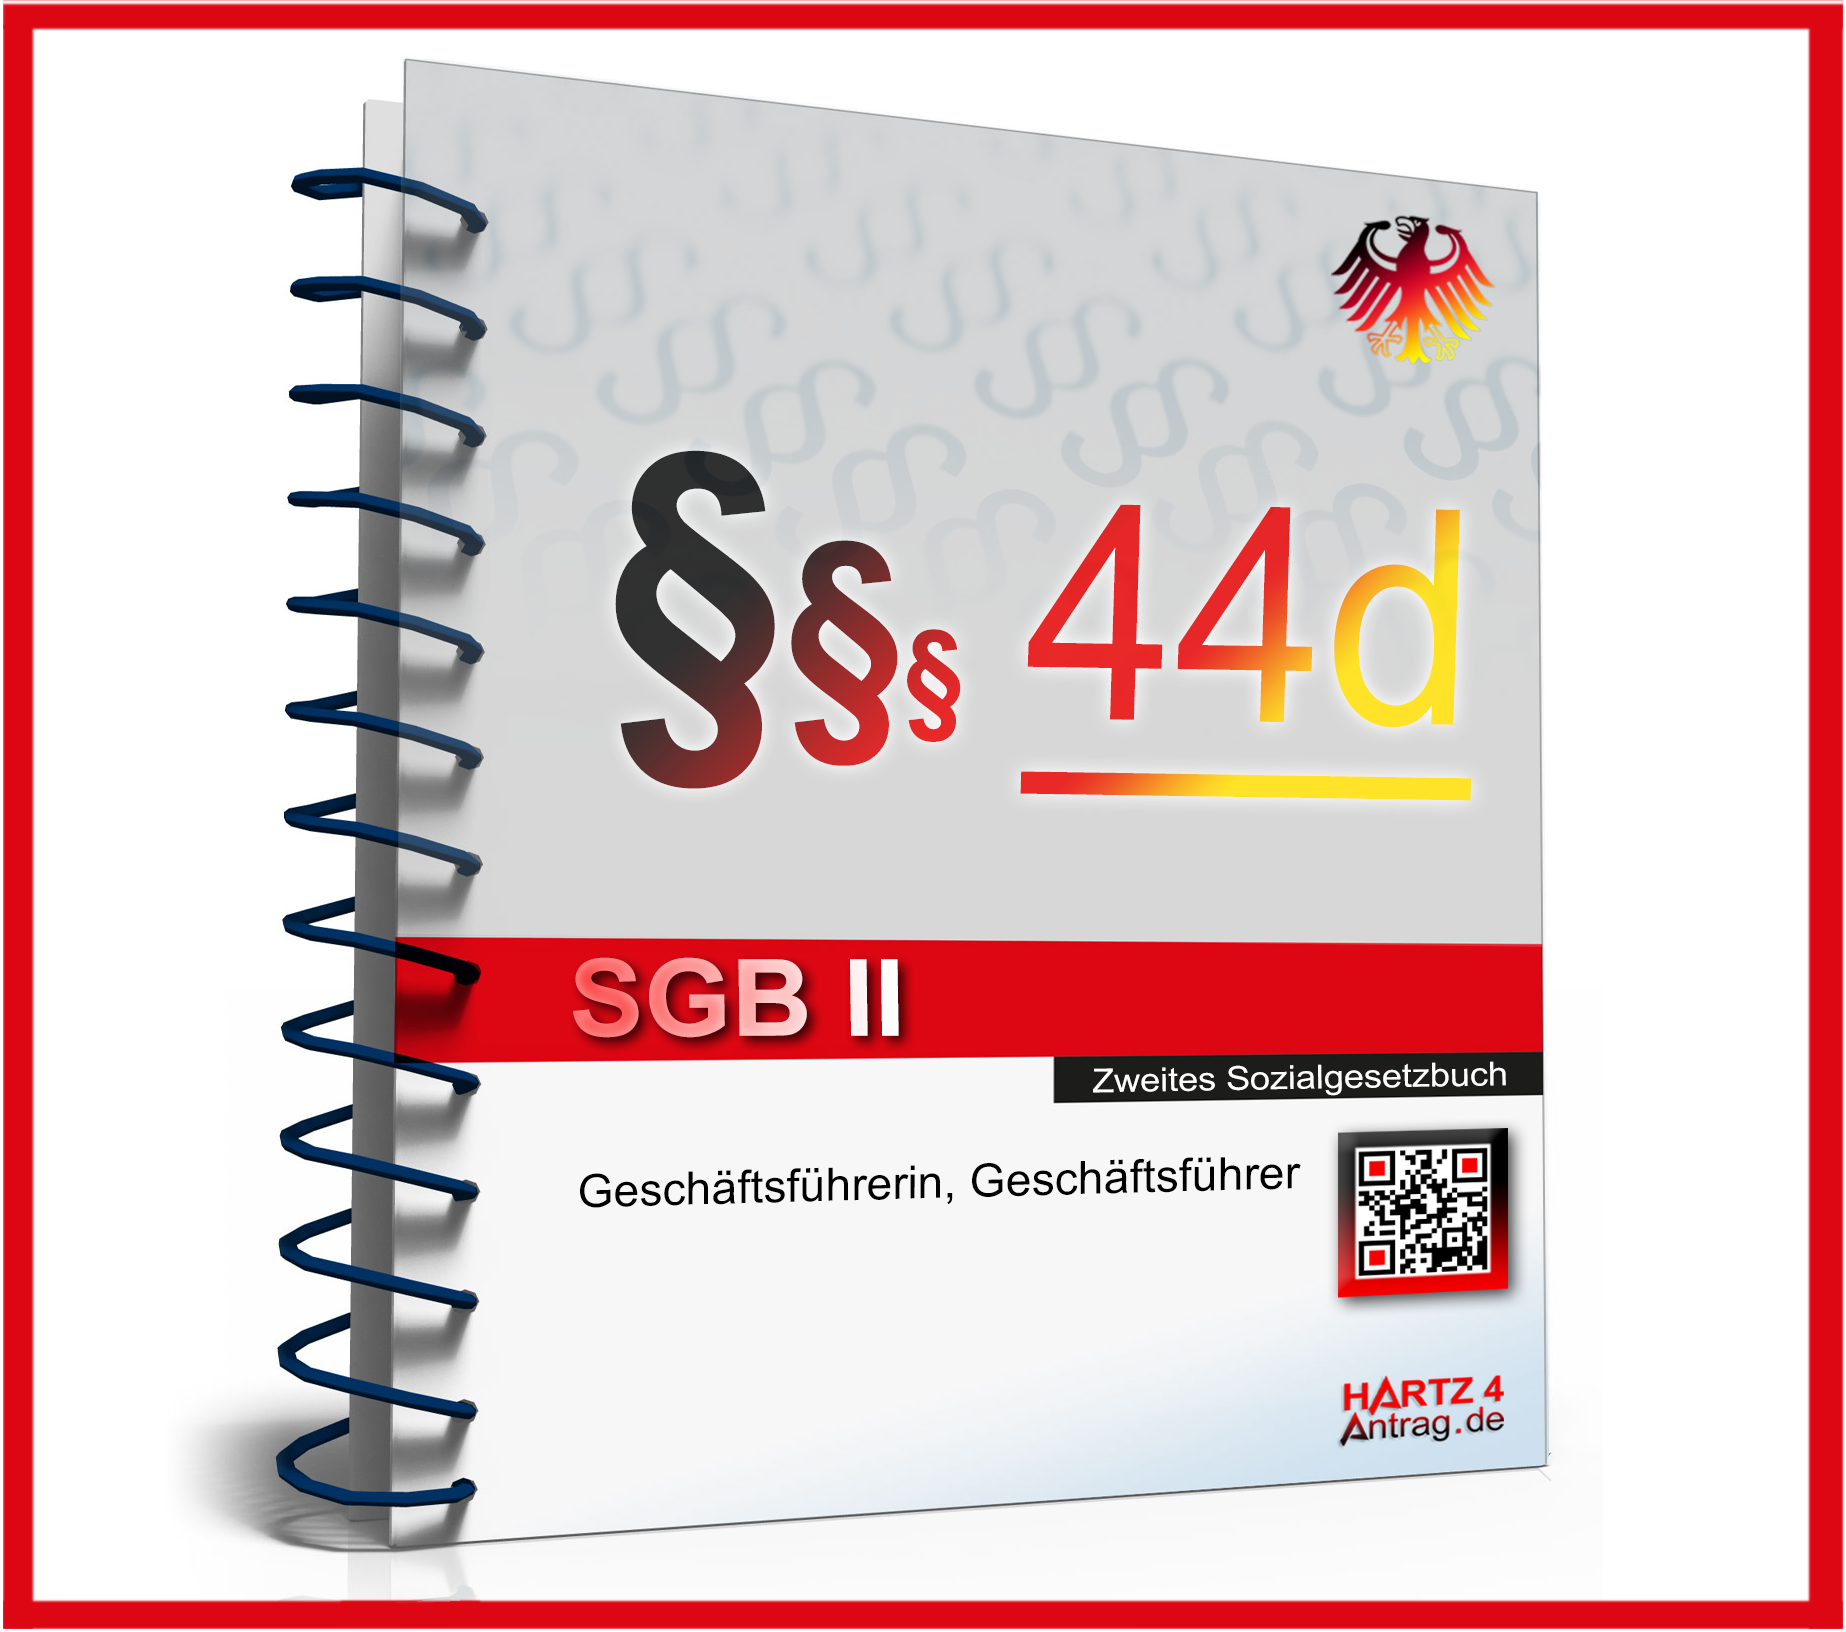 § 44d SGB II